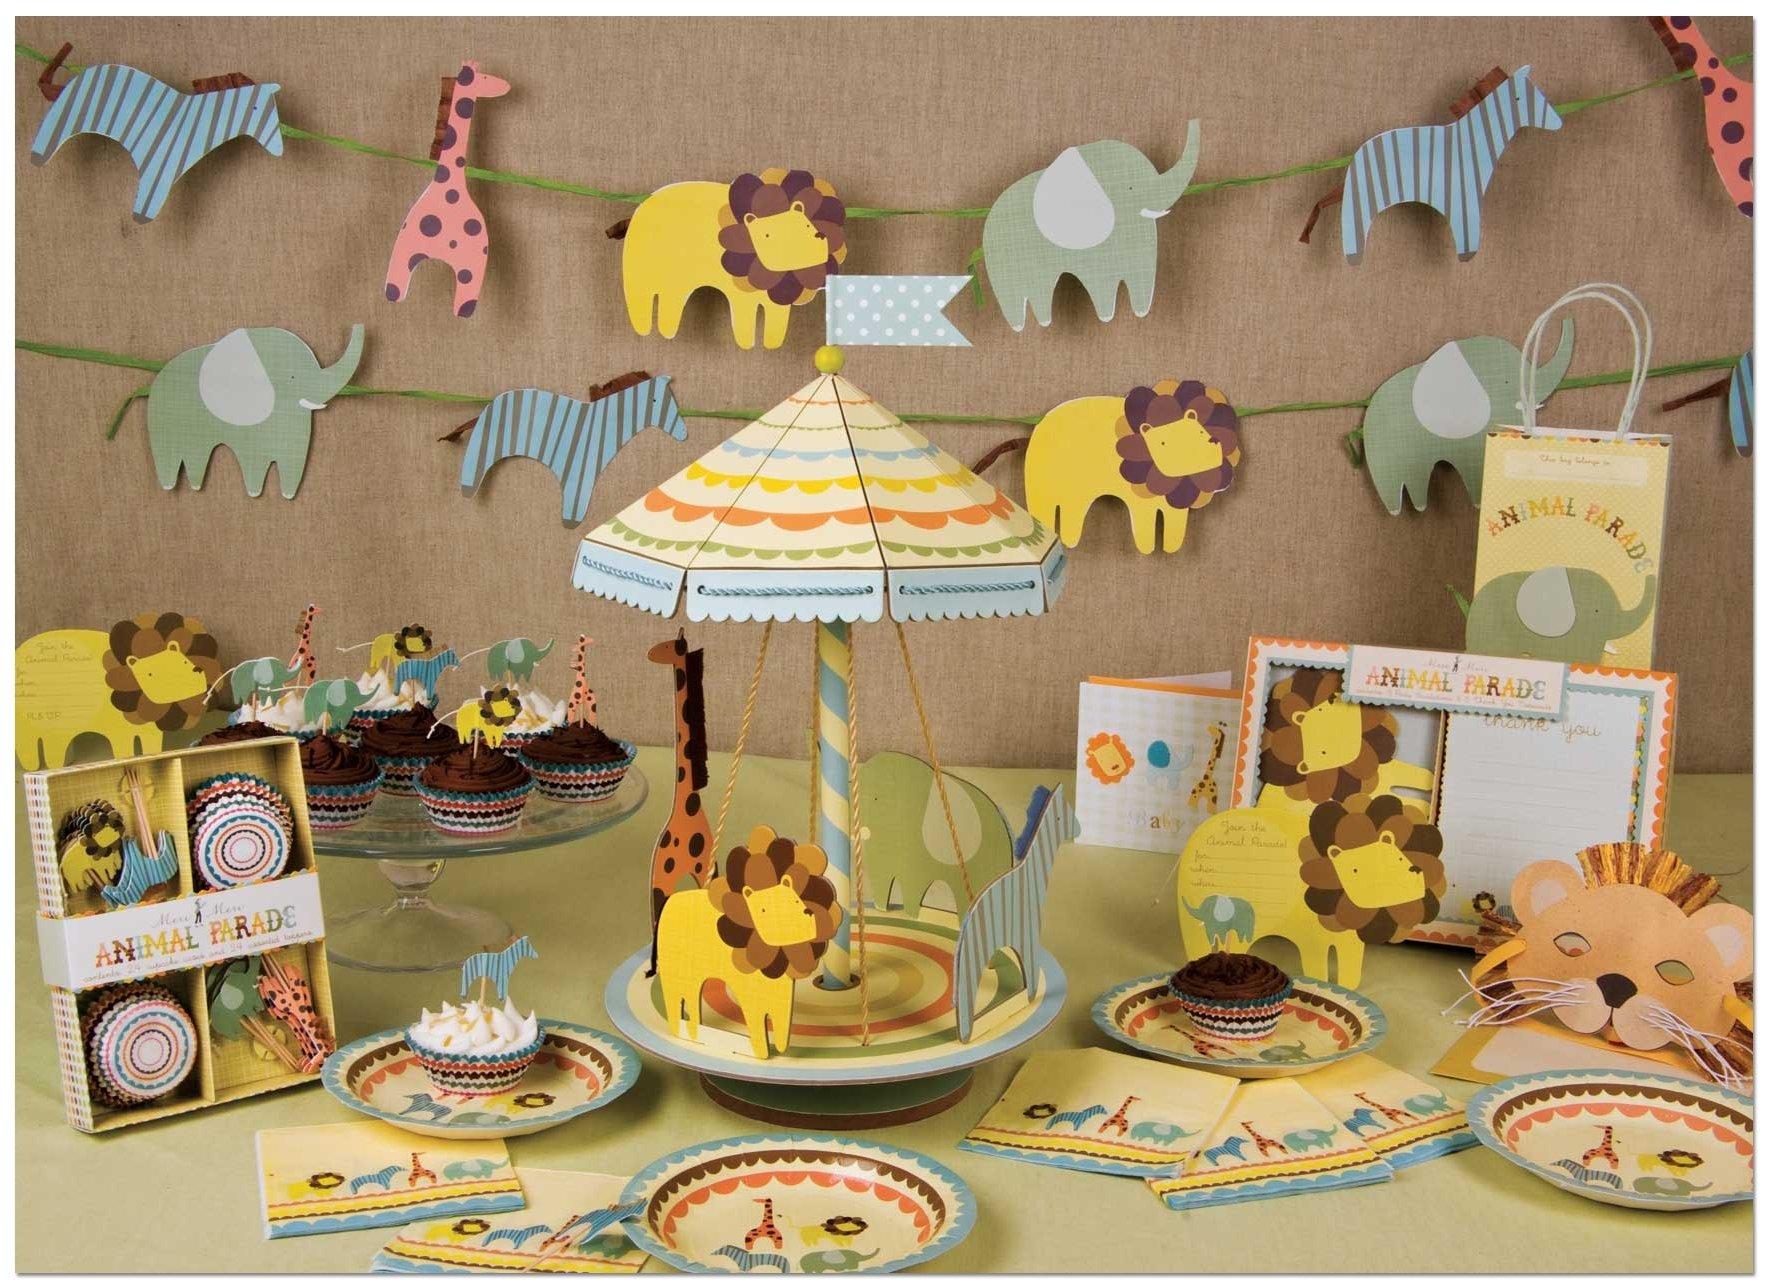 10 Spectacular Animal Themed Birthday Party Ideas animal party decoration ideas weddings eve loversiq